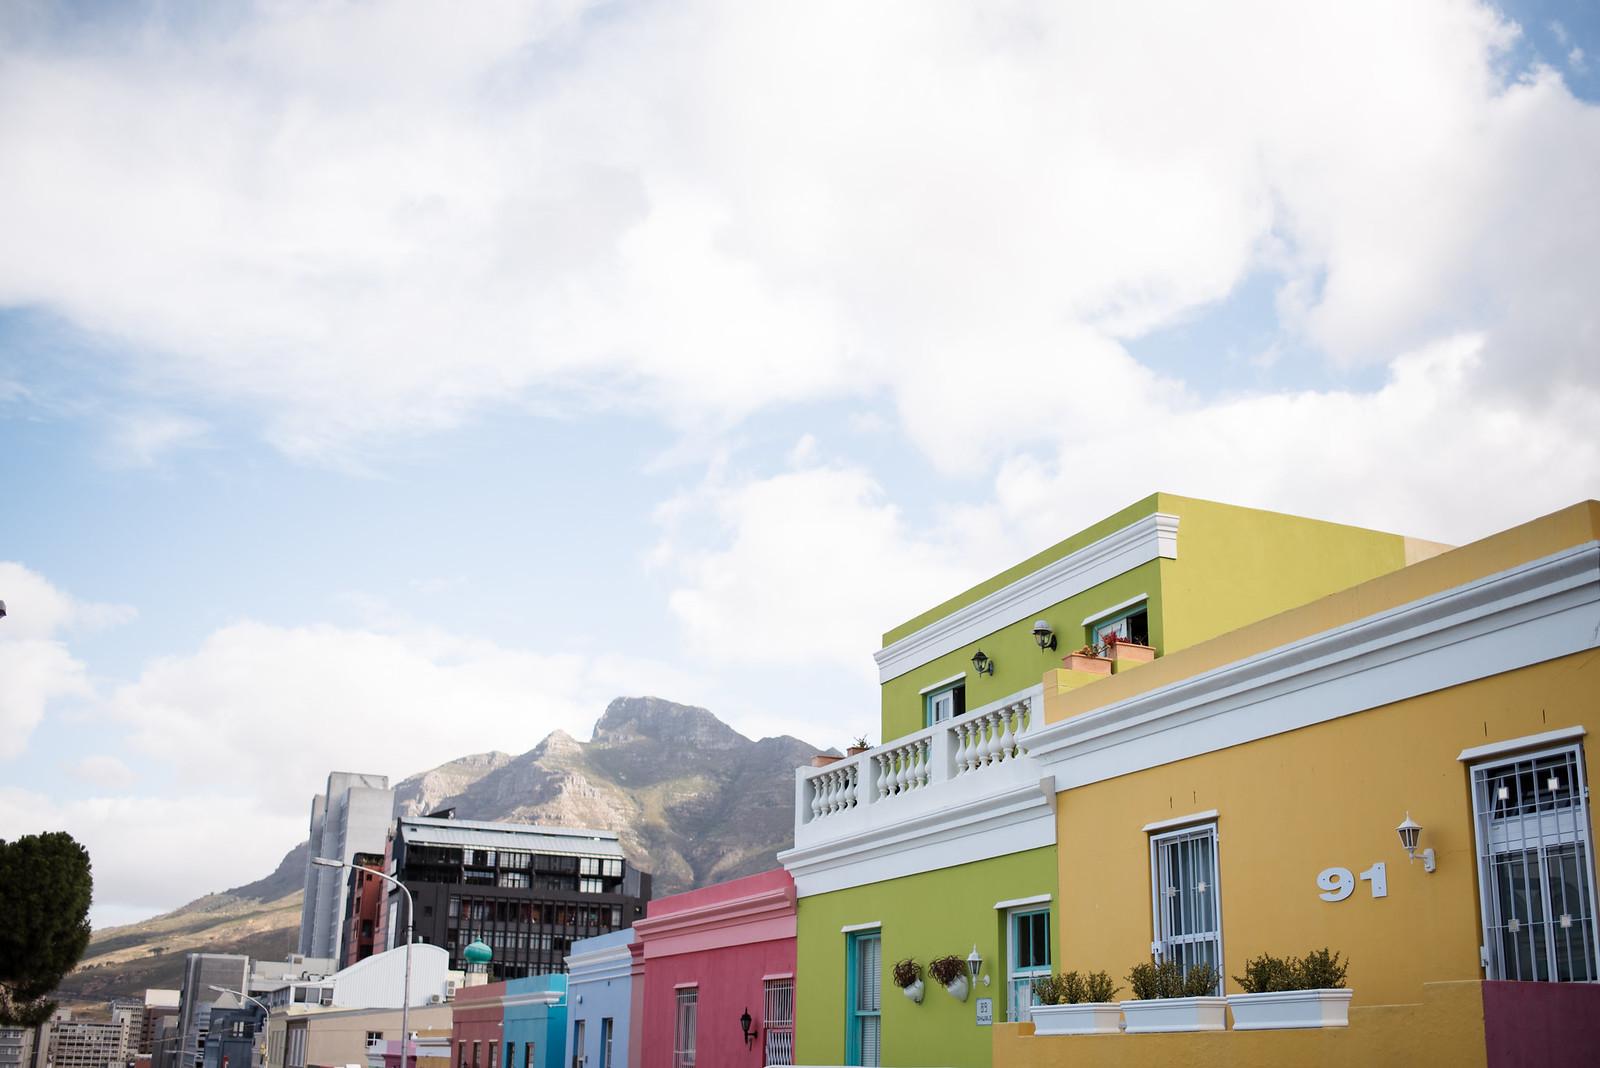 Colorful houses in Bo-Kaap Cape Town on juliettelaura.blogspot.com